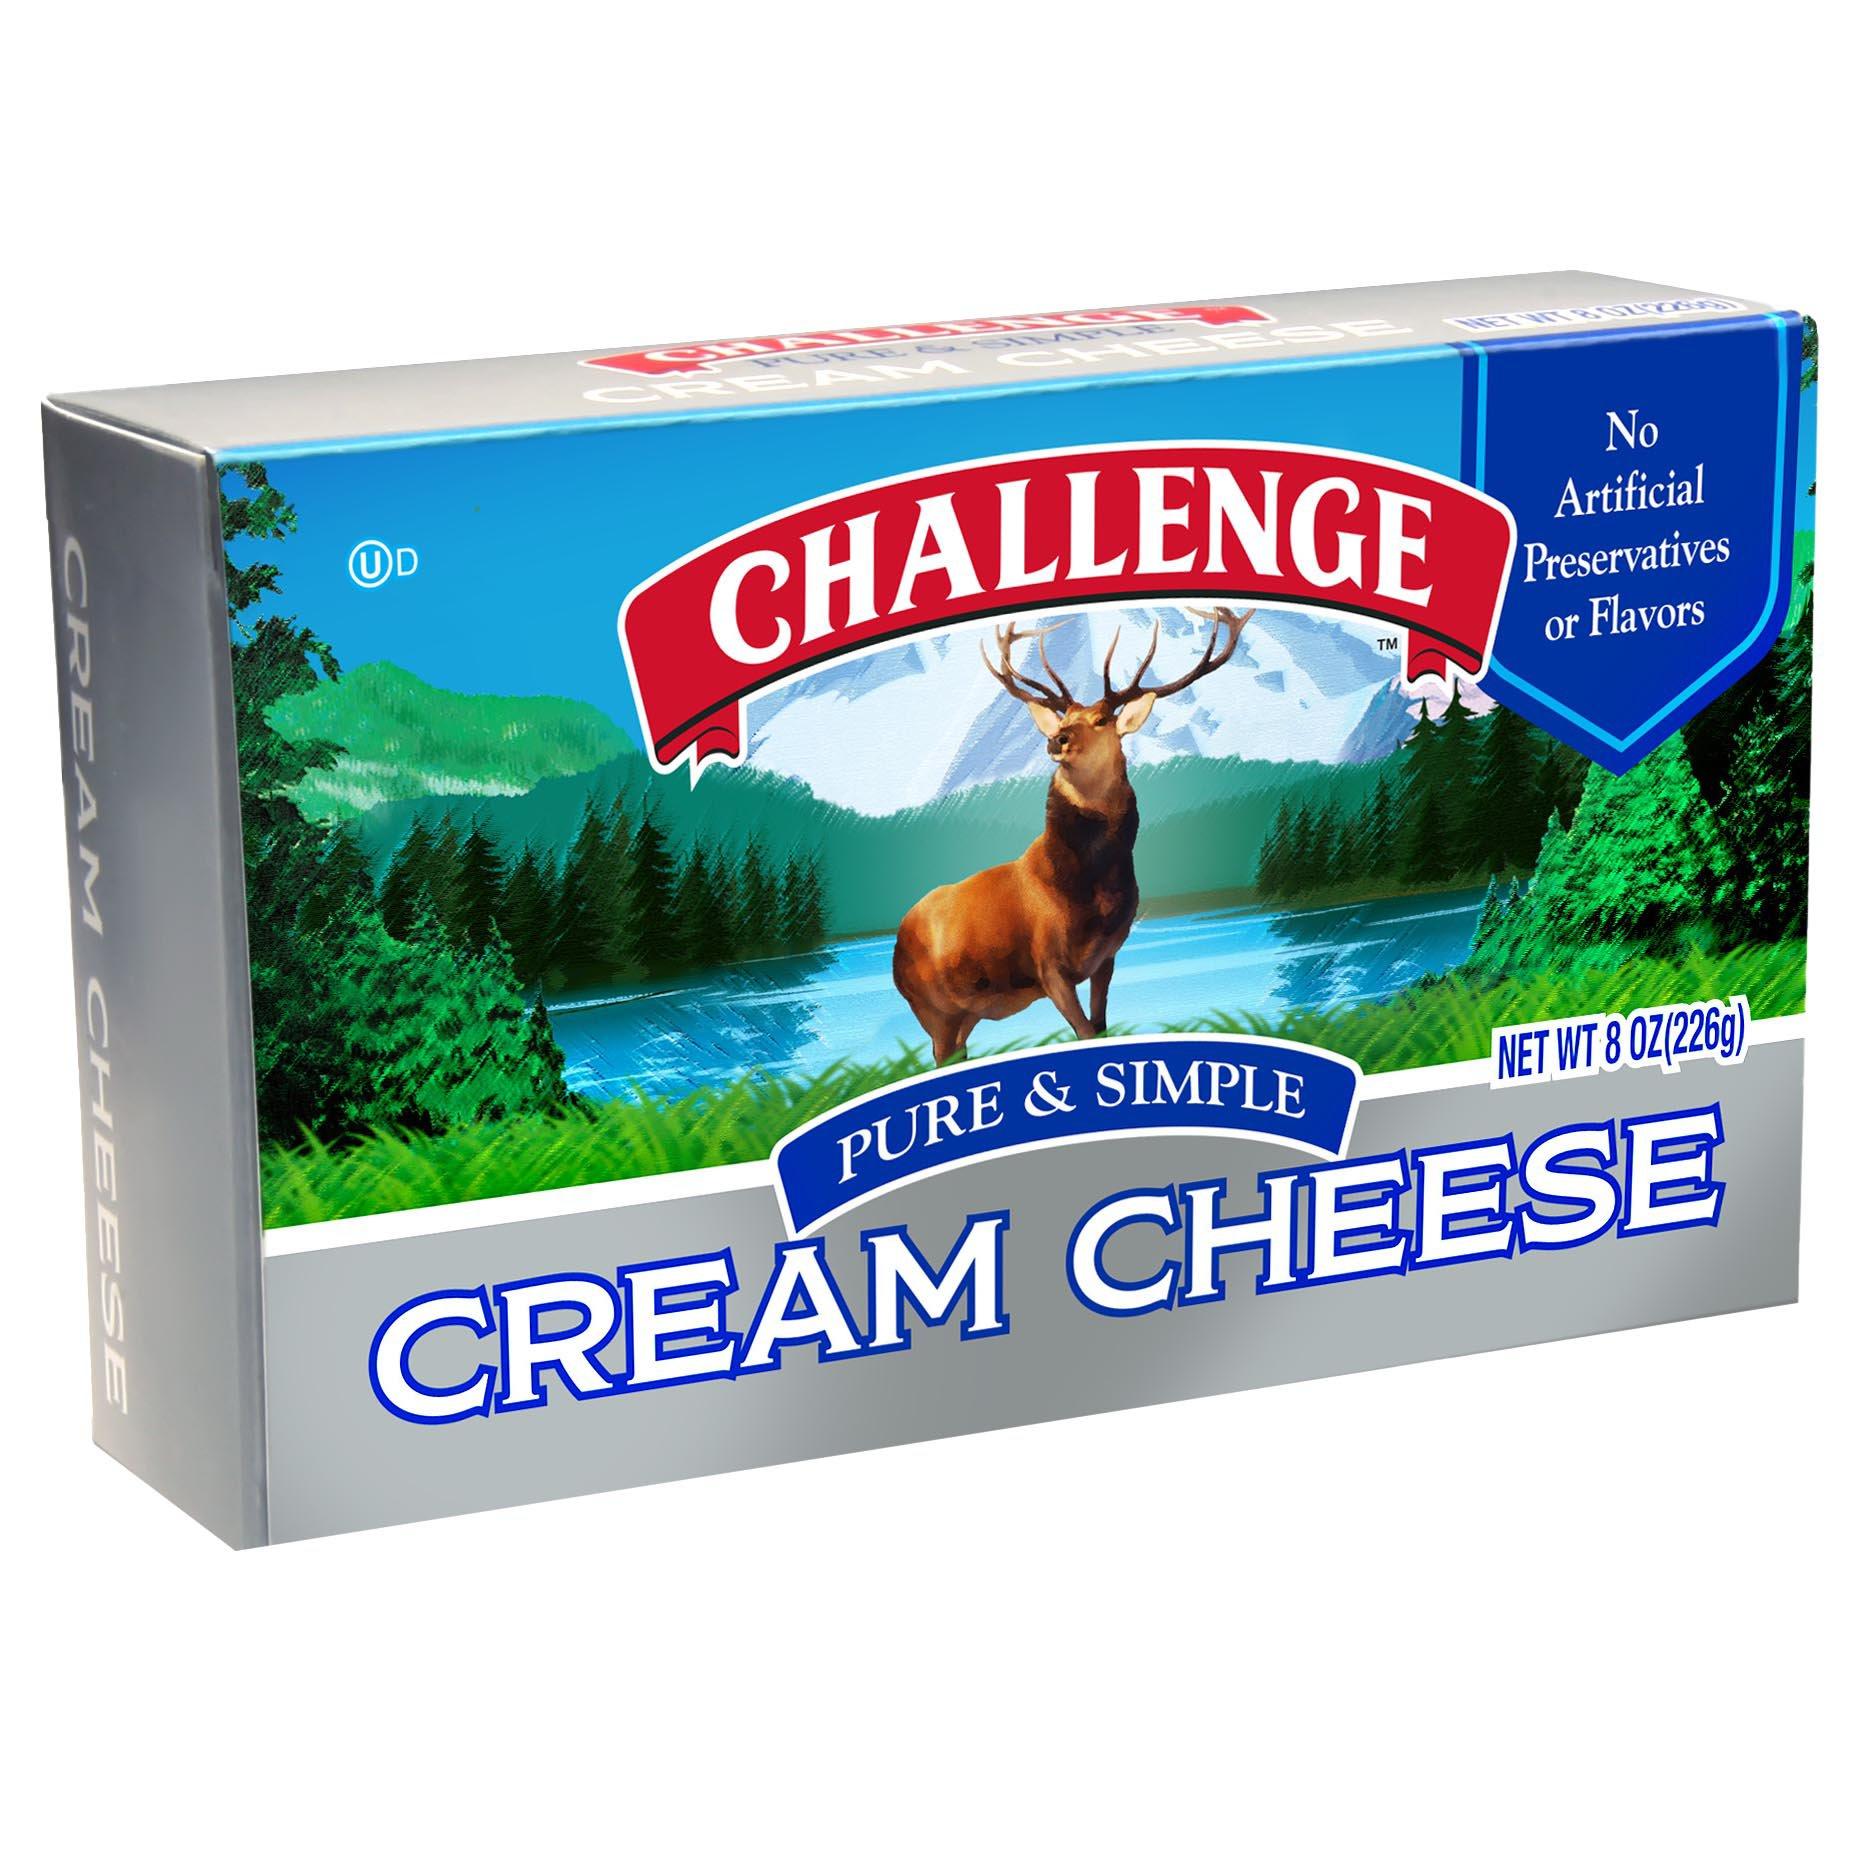 cream cheese shop heb everyday low prices online